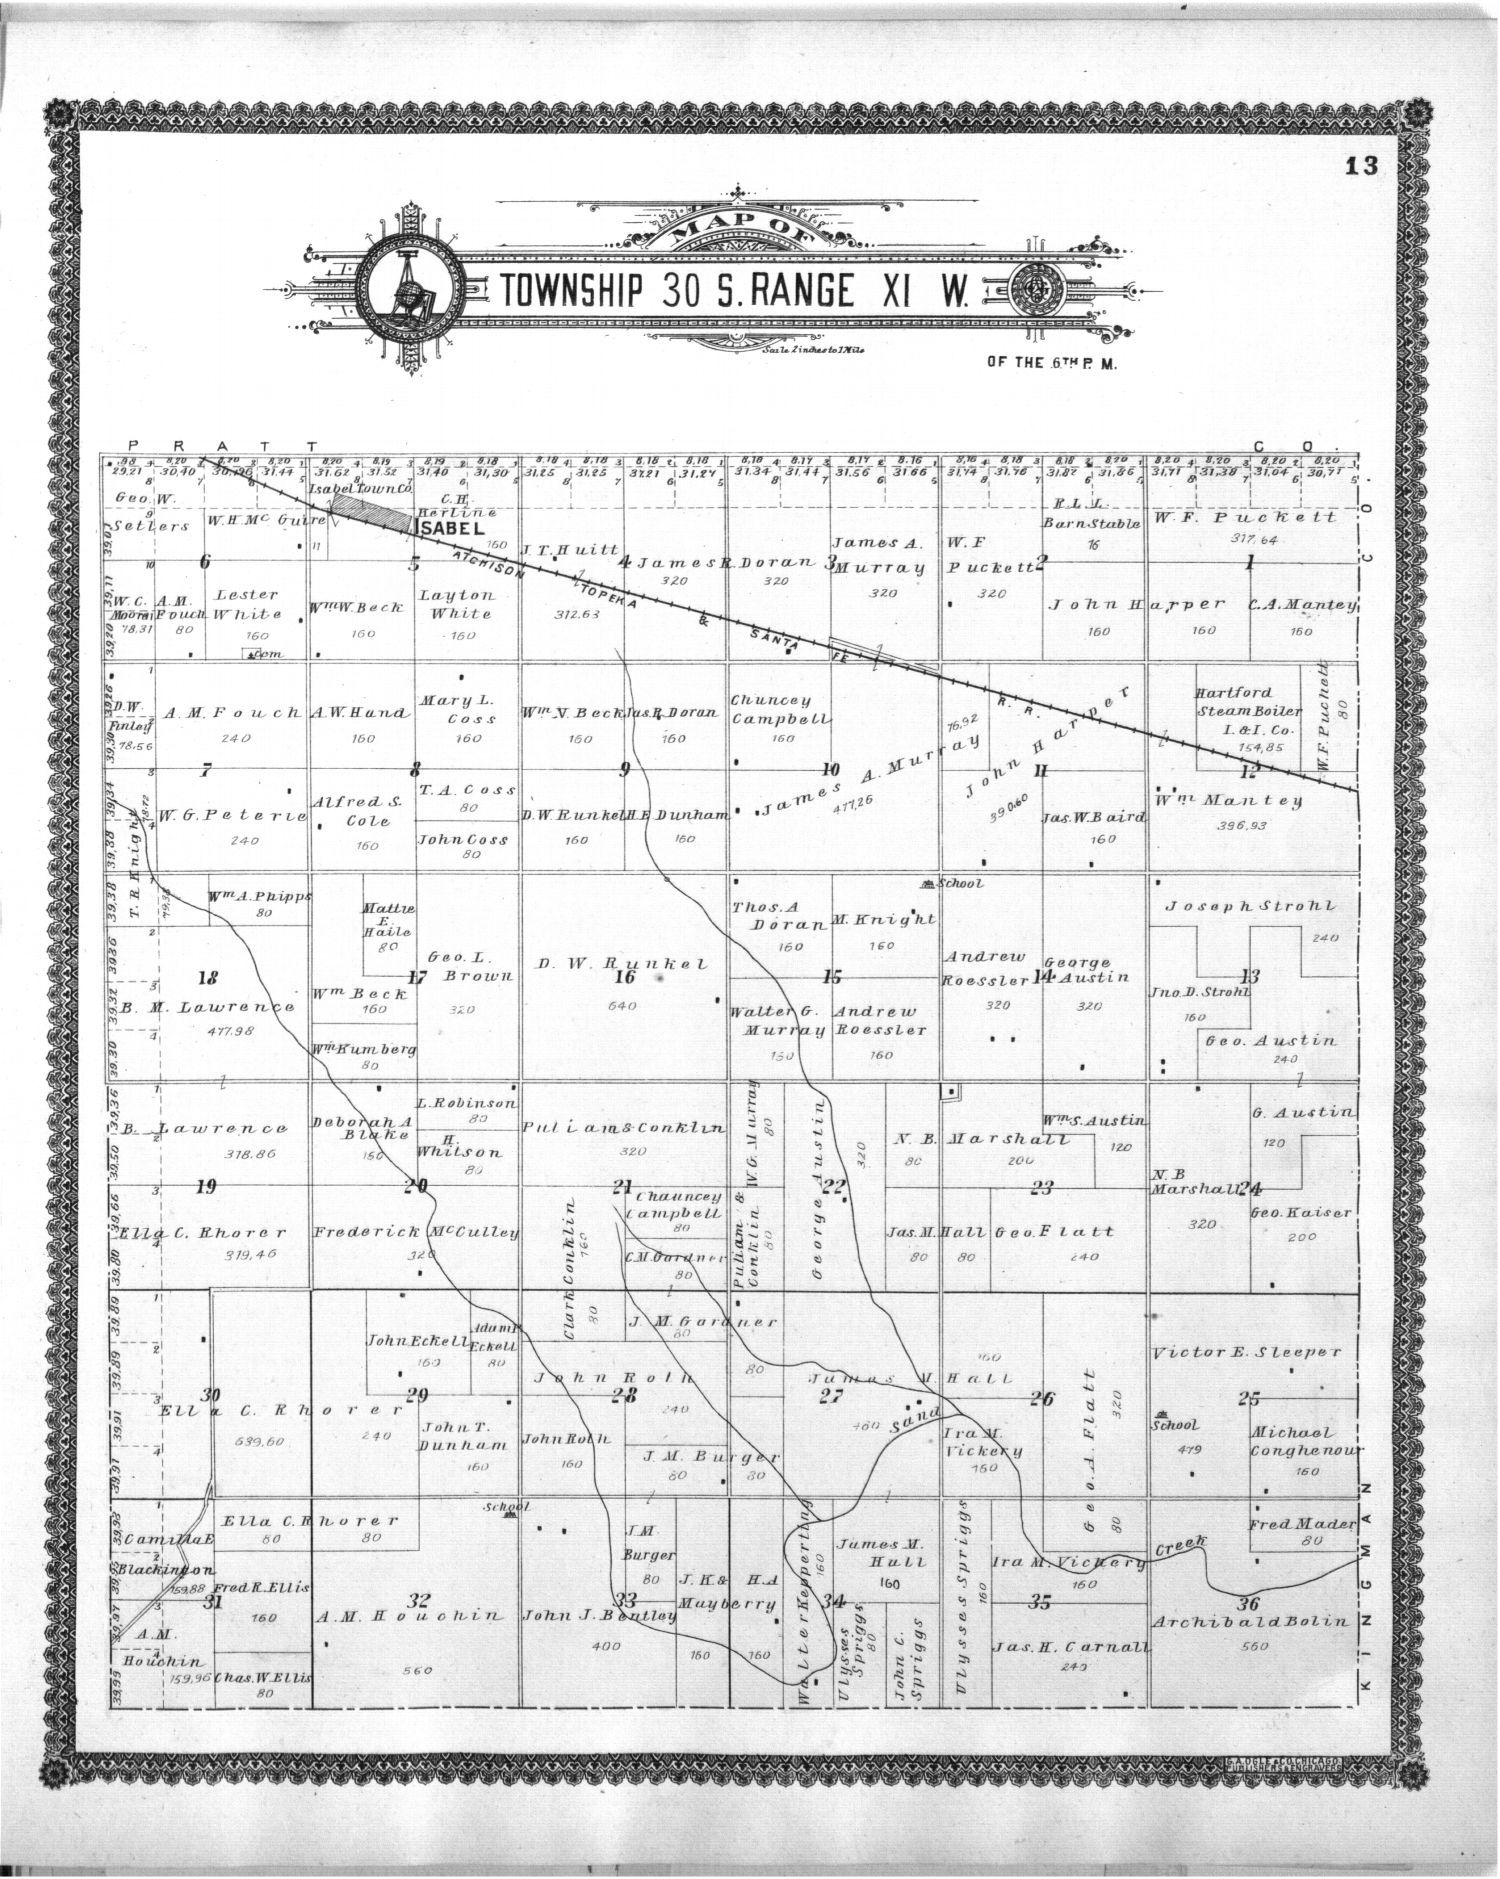 Standard atlas of Barber County, Kansas - 13